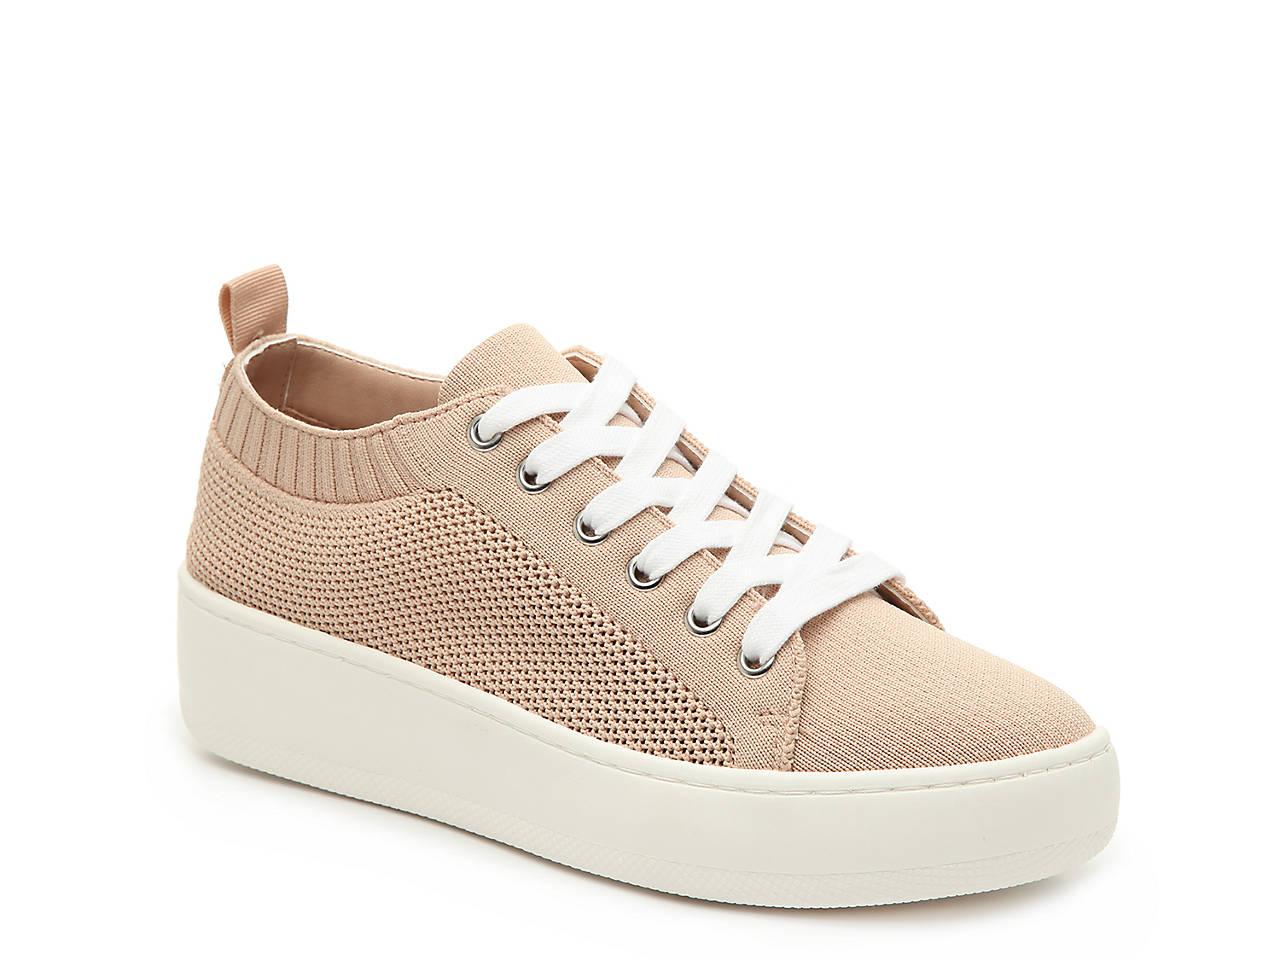 d30baa7f65a Bardo Platform Sneaker